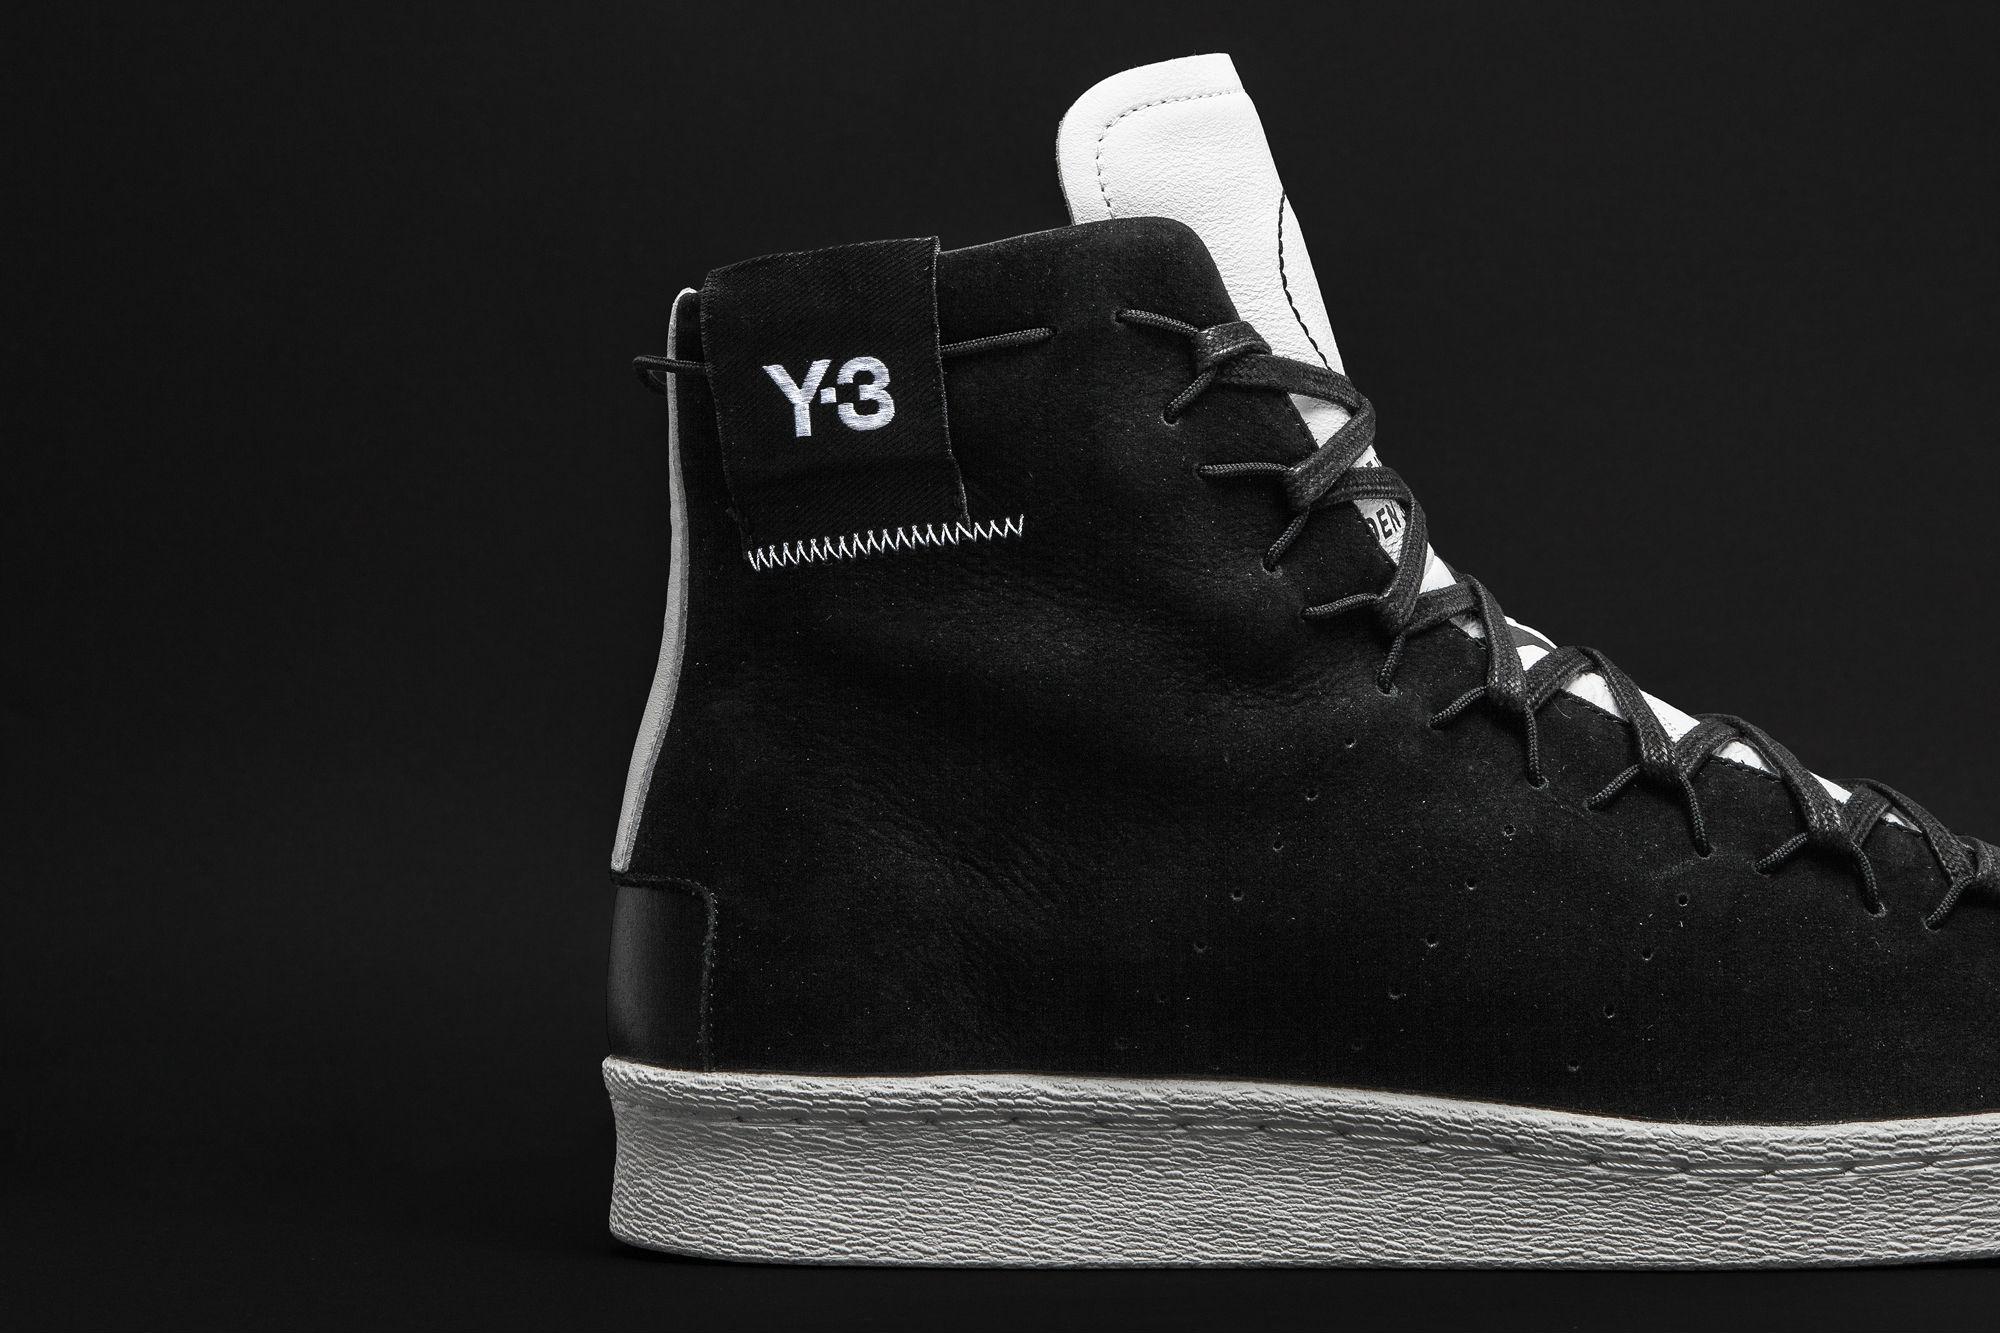 The adidas Y-3 Super High Black White